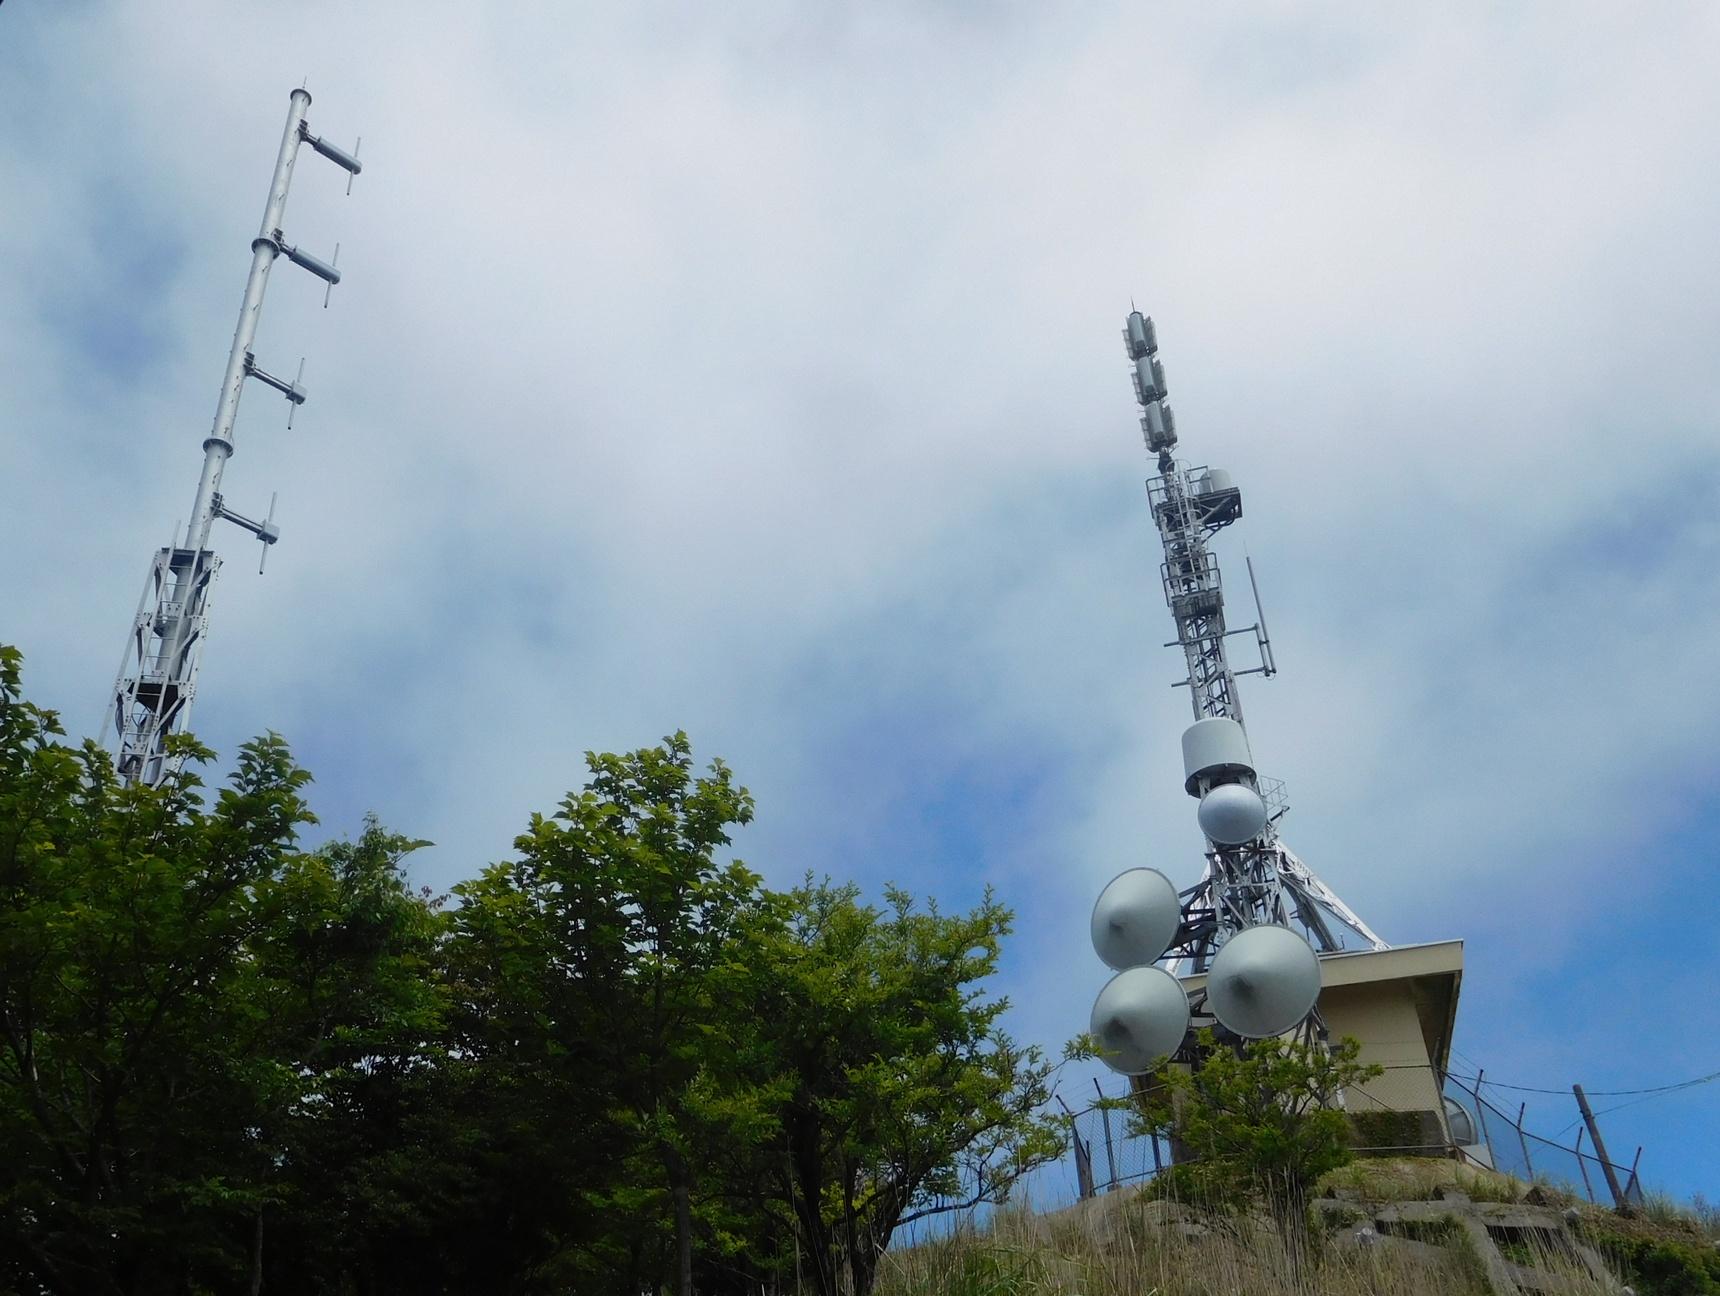 File:NHK JOHG Akune TV-FM Repeater 2017 JPG - Wikimedia Commons